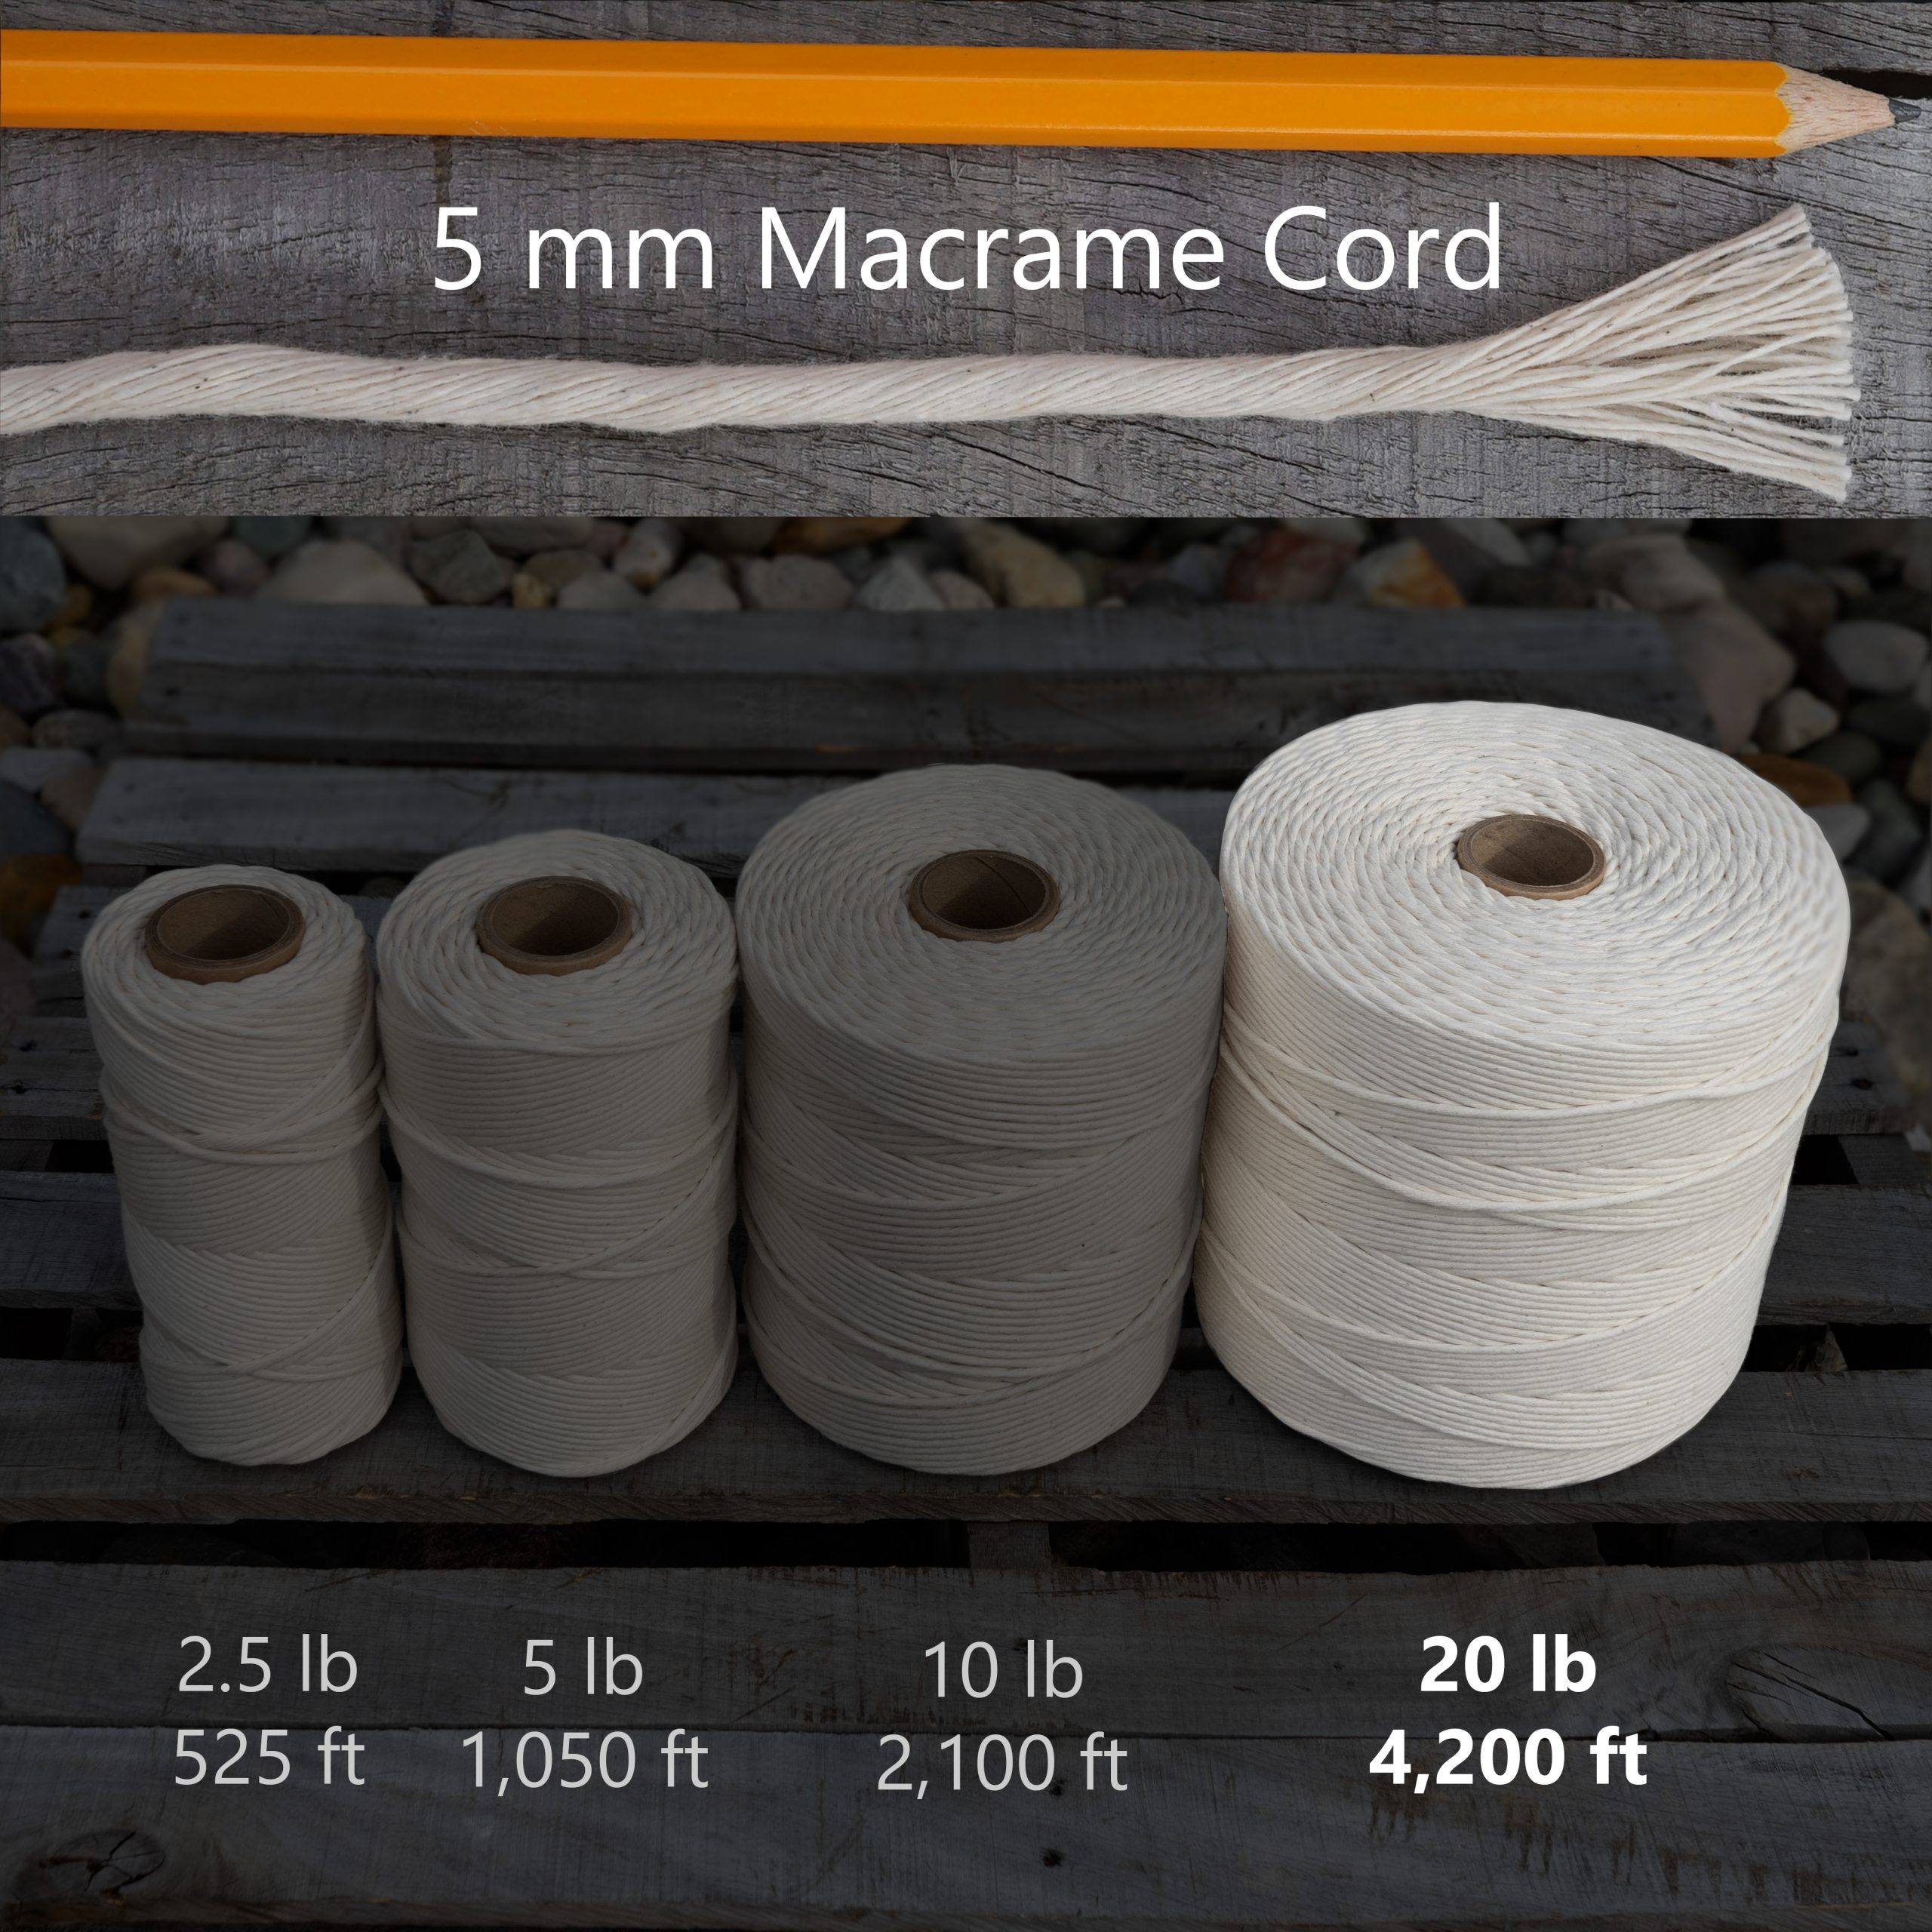 5 mm x 20 lb macrame tube